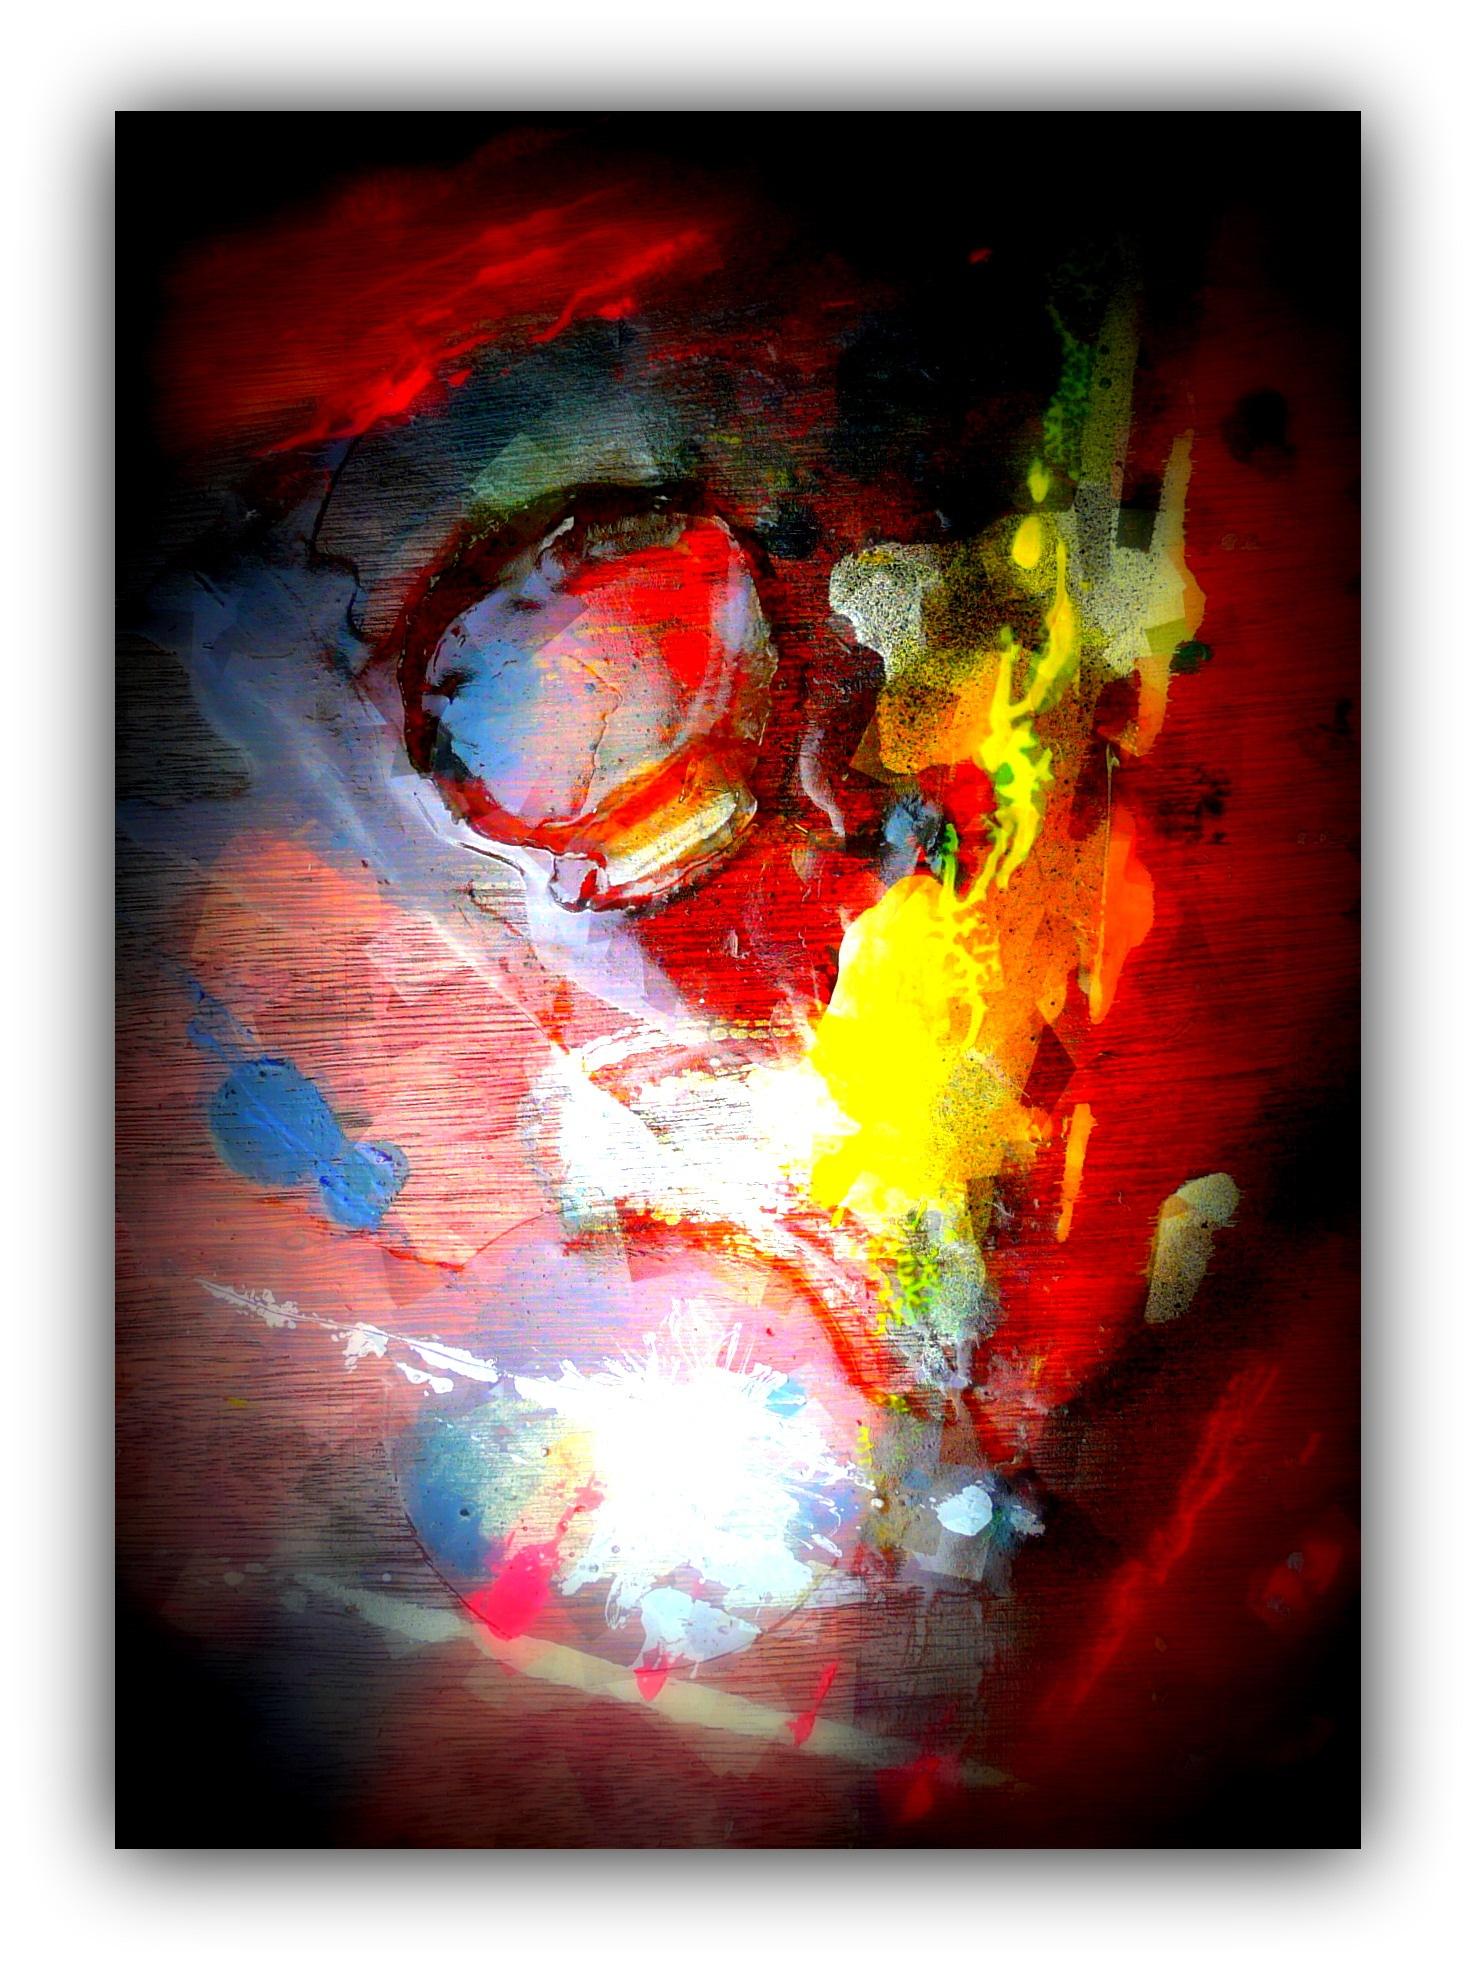 Like the Splash of Yellow by PhilipArt